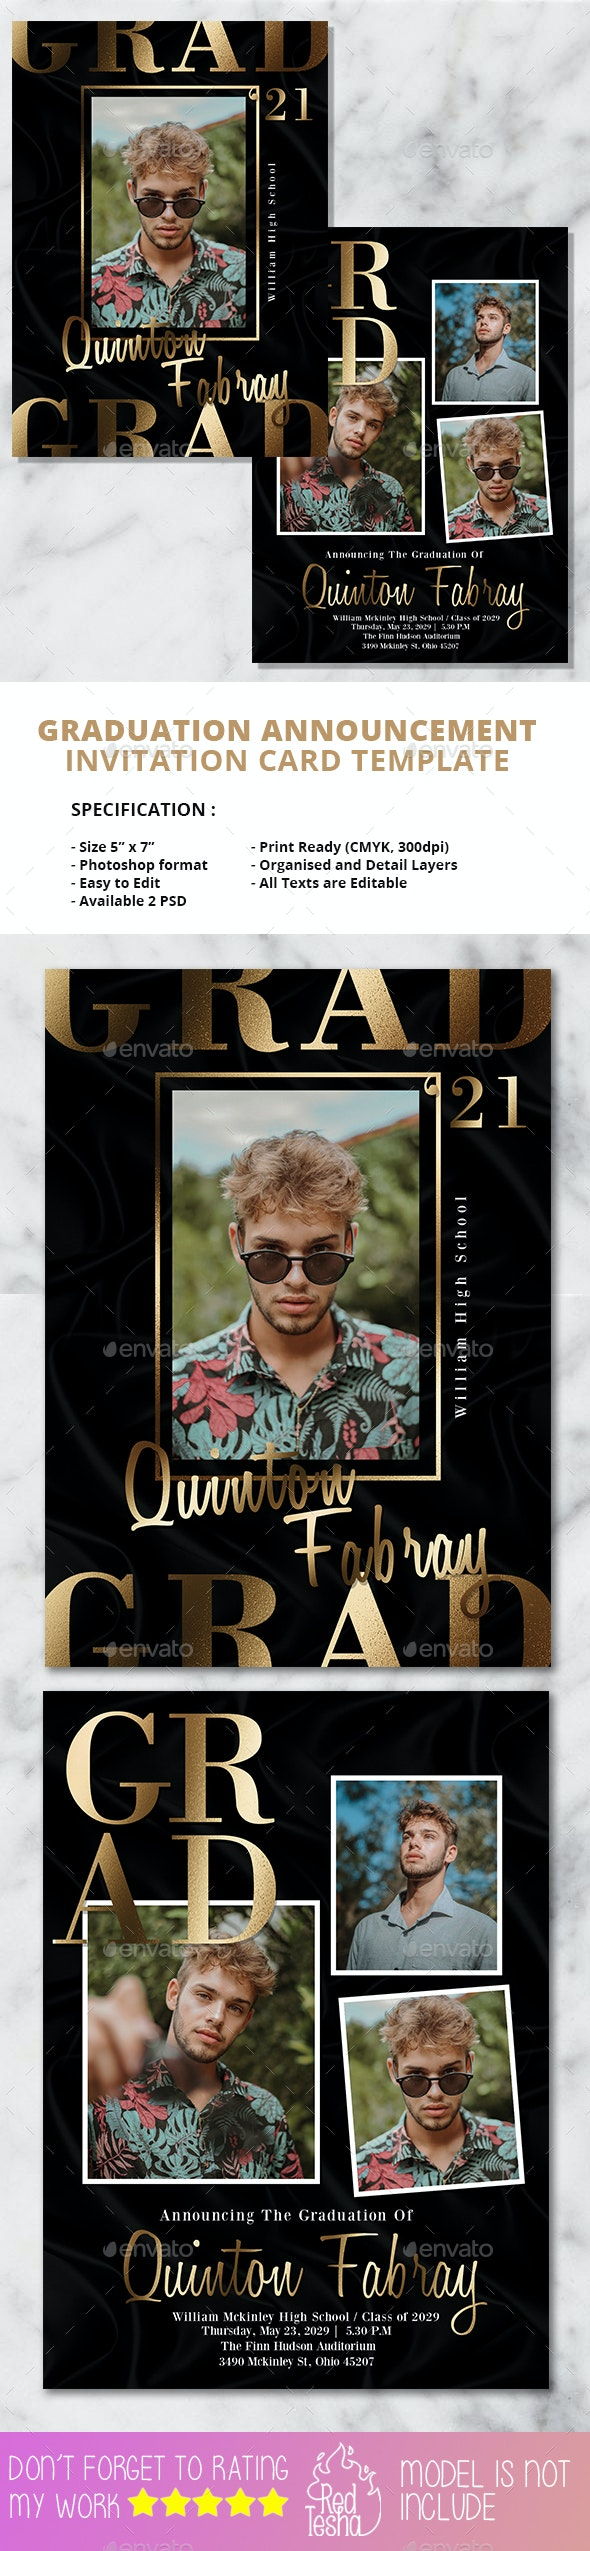 2 PSD Graduation Invitation Card - Cards & Invites Print Templates